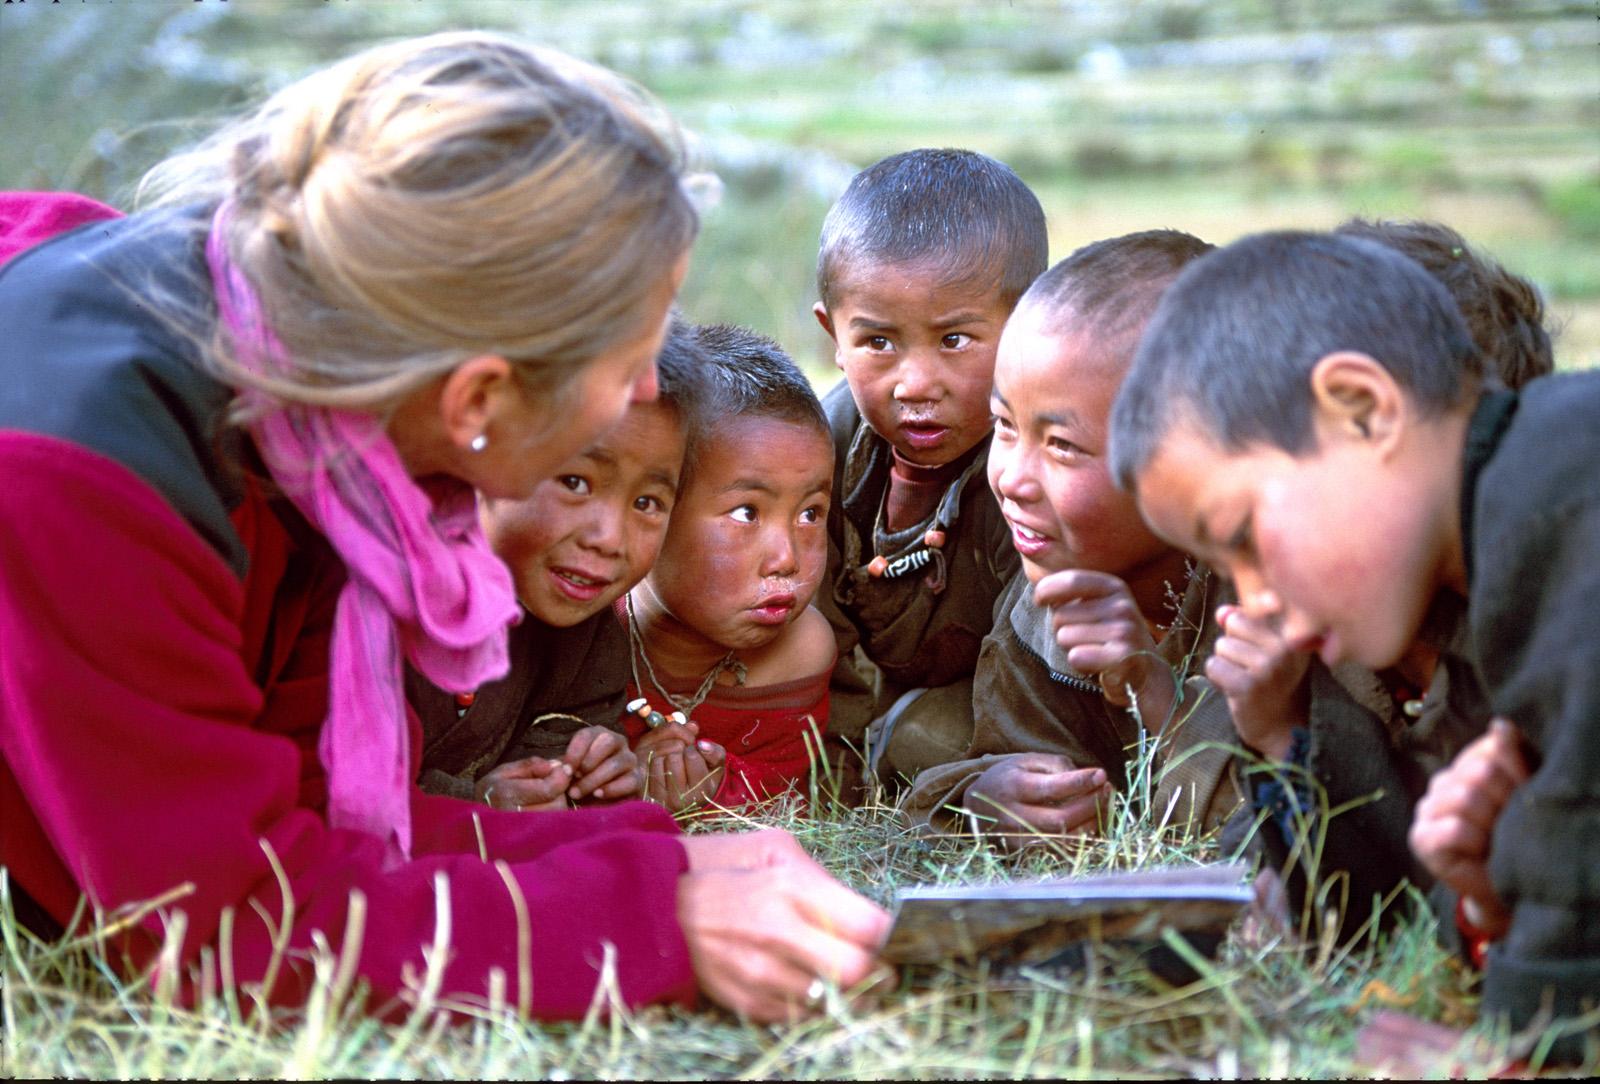 Baiba breaks the ice by sharing photos of the Canadian Rockies in village of Samagaon, Manaslu area. Nepal. 1994.